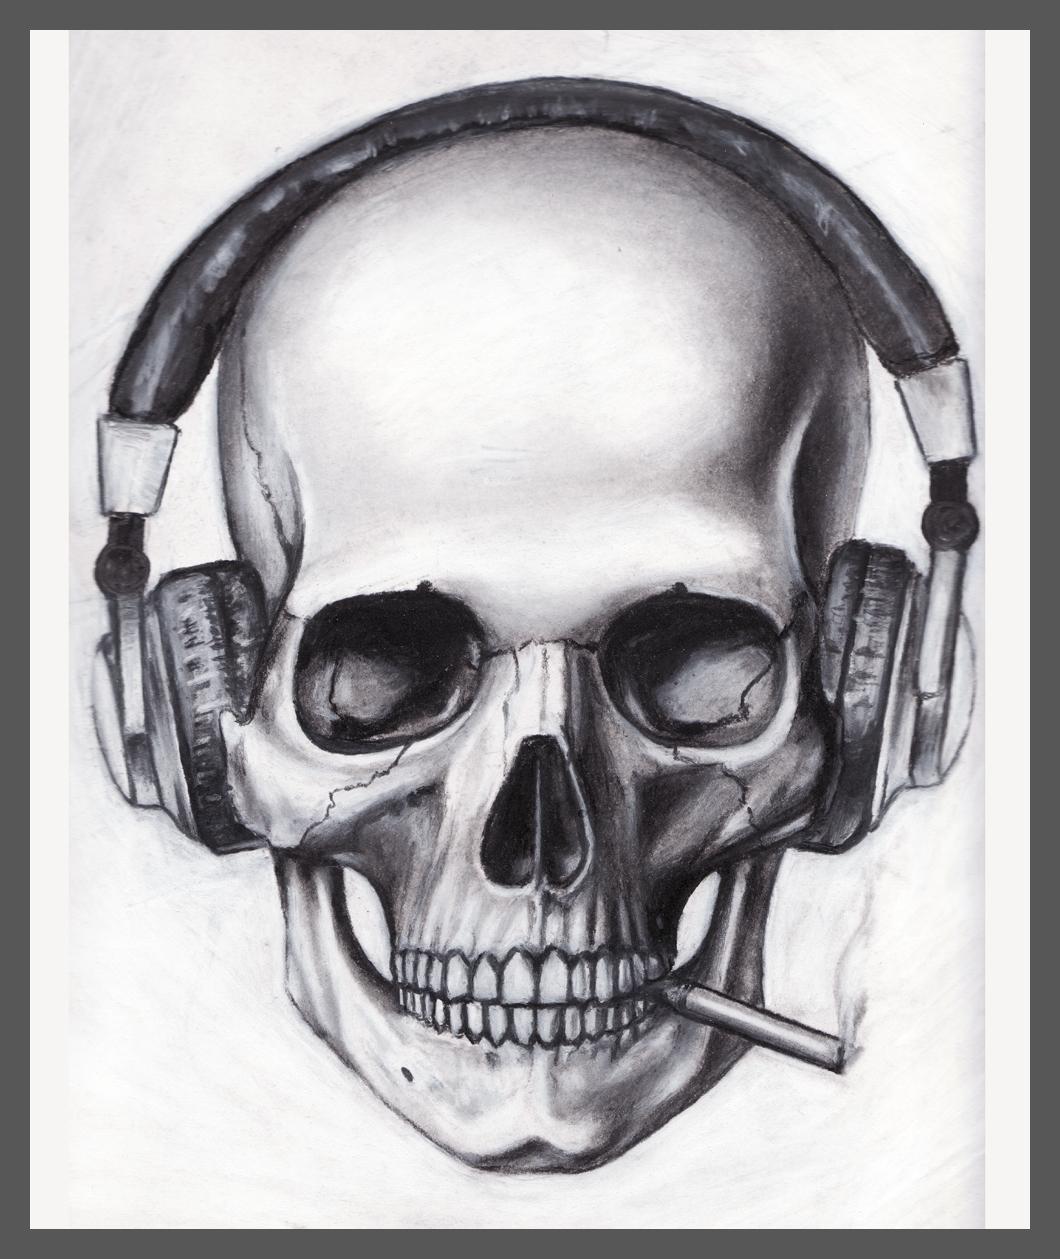 Drawn headphones On Skulls Free Skull library